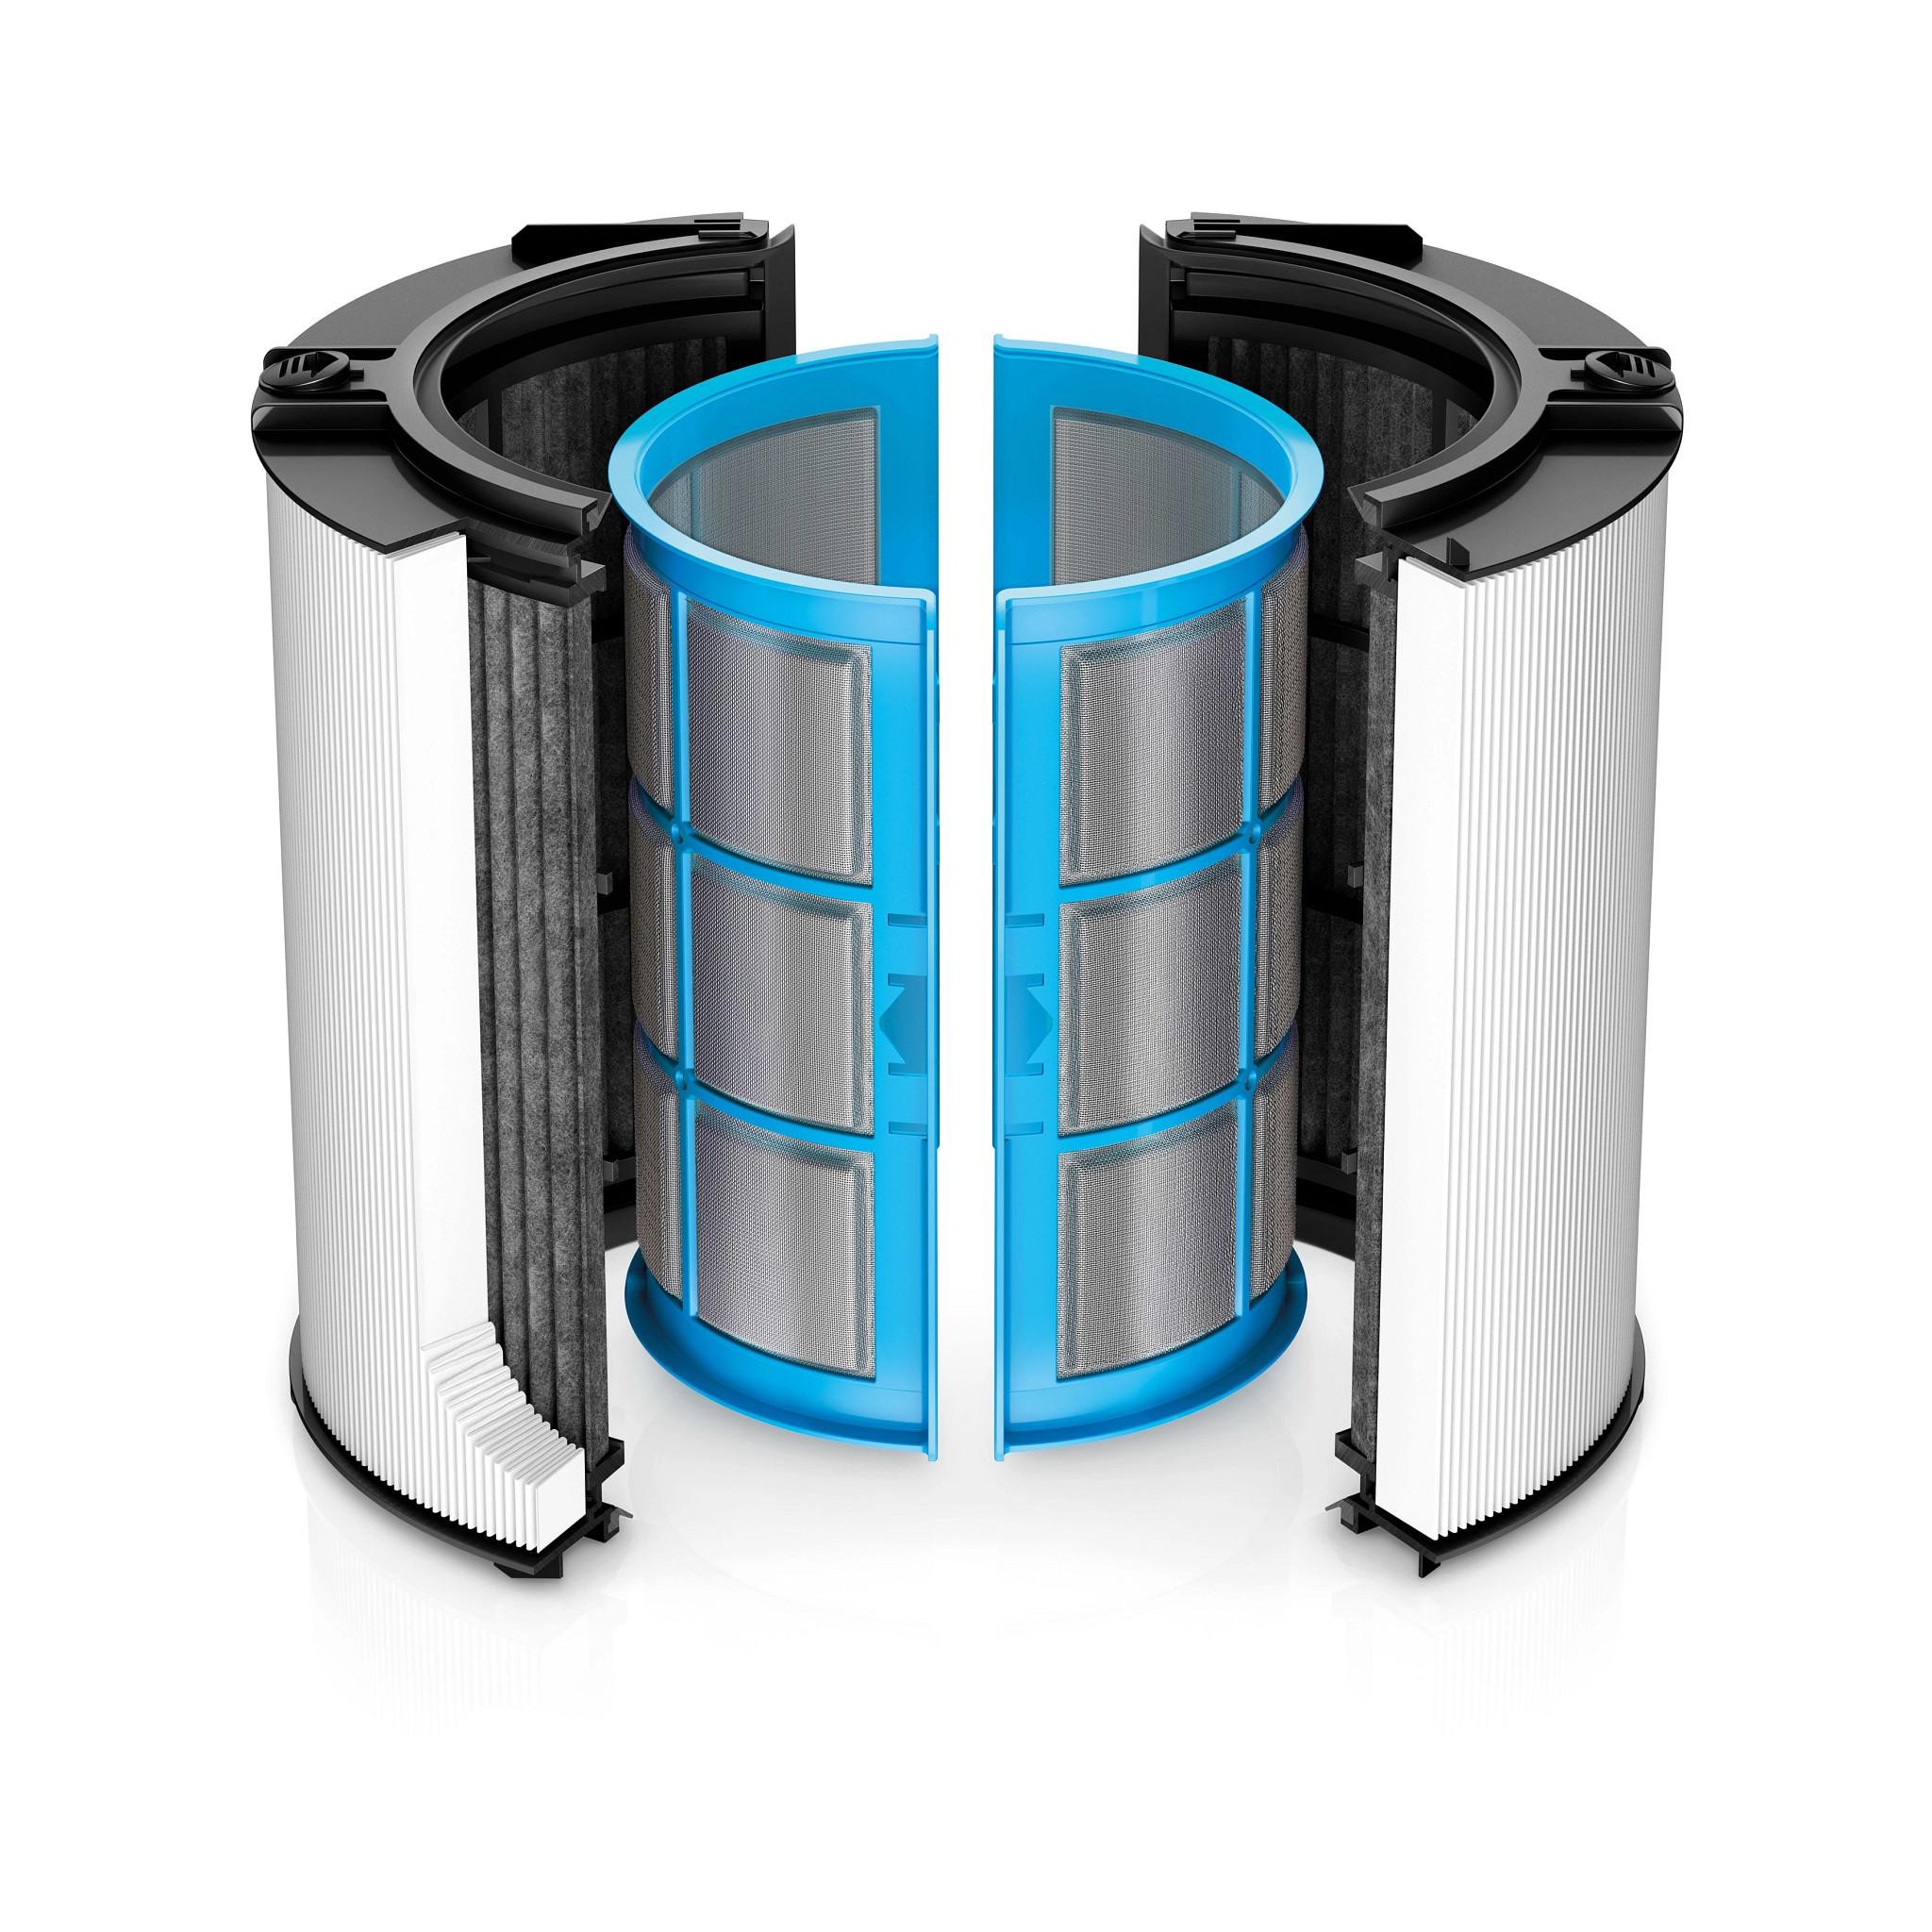 Dyson Purifier Hot Cool Formaldehyde scocombifilter